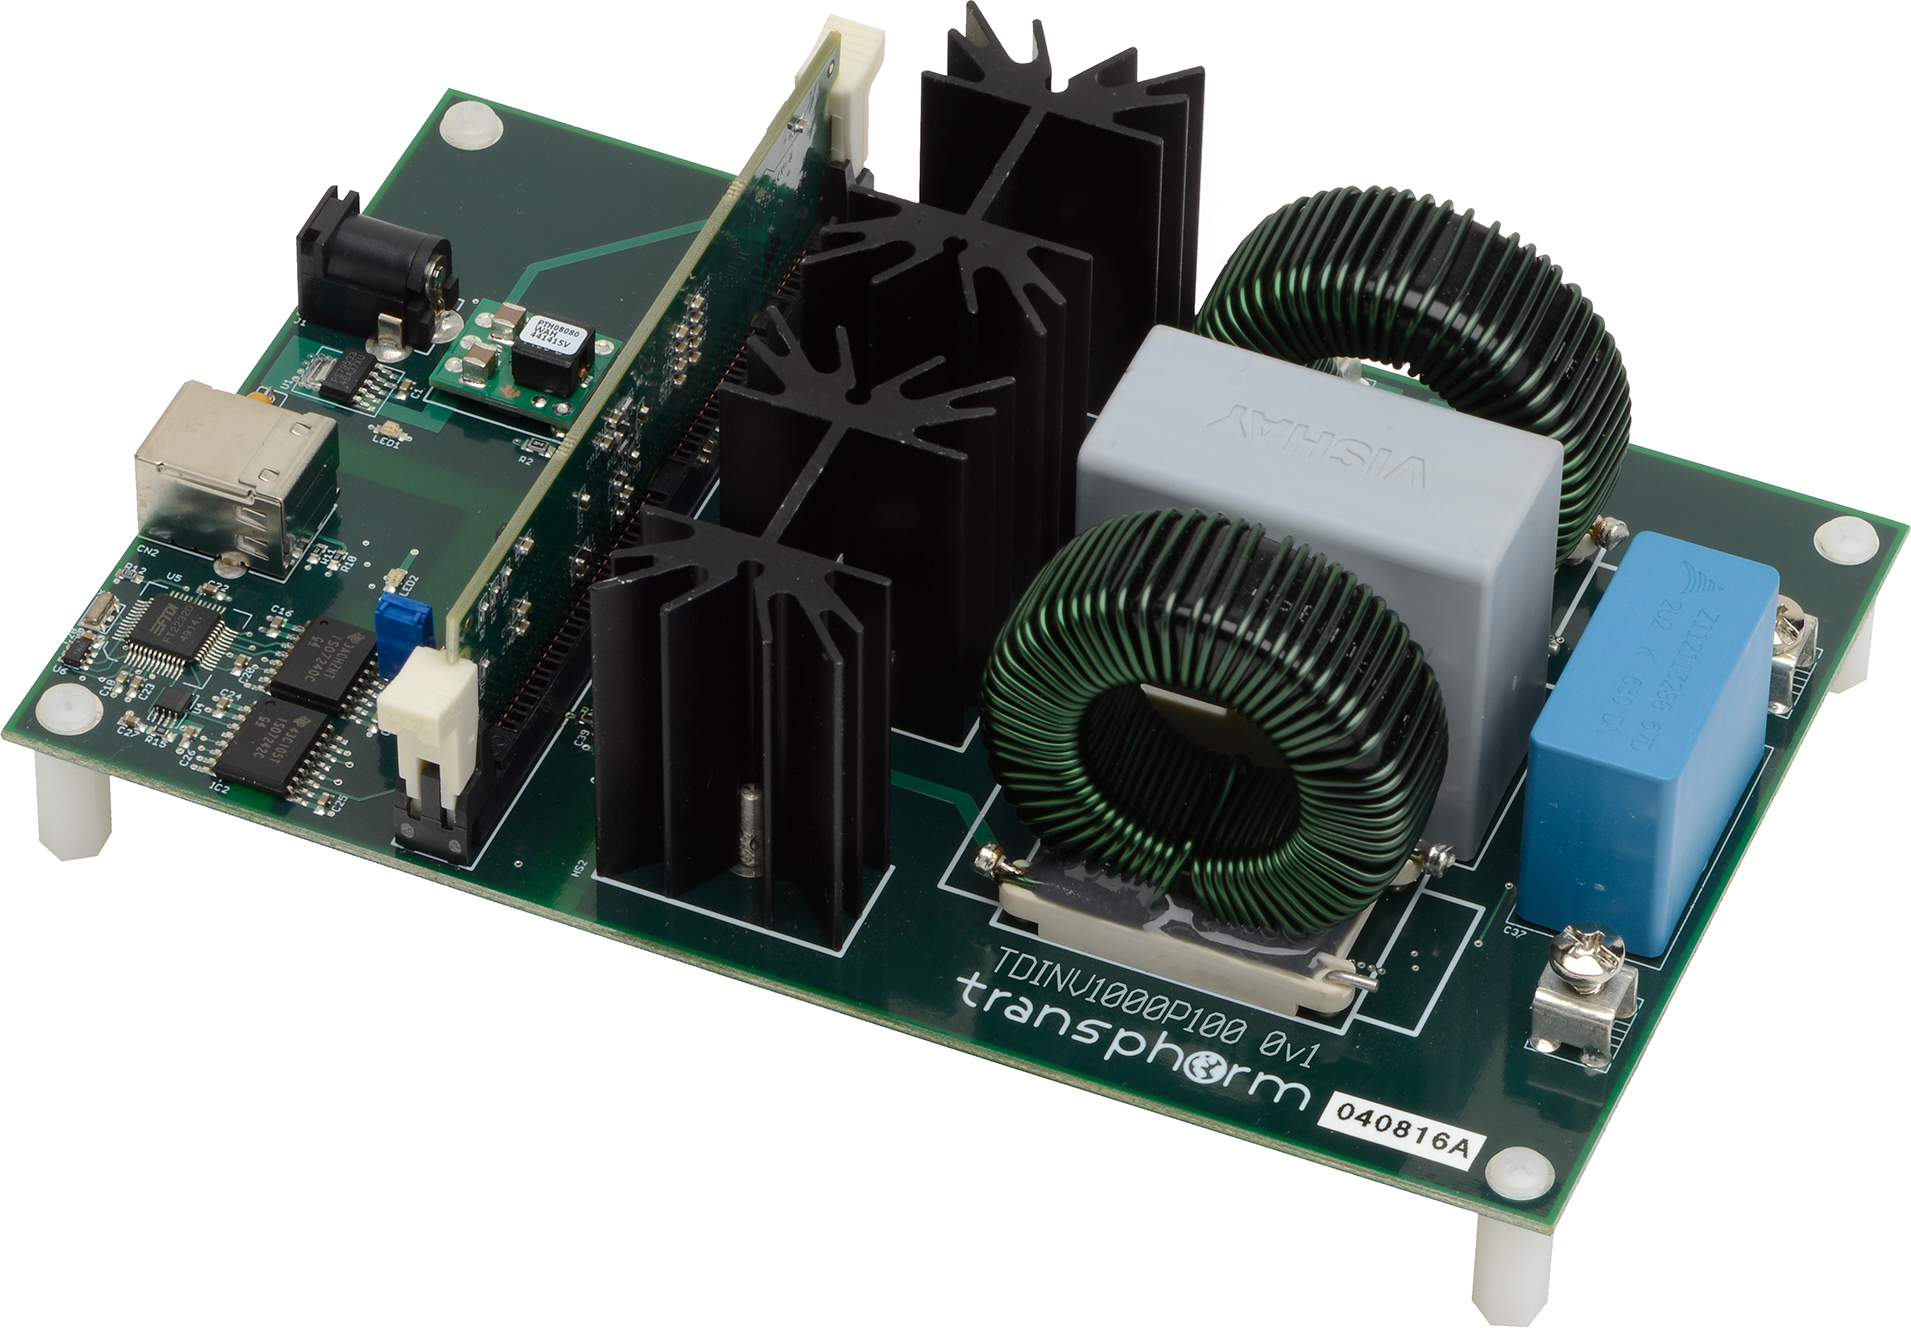 Solar Inverter Pcb Layout - PCB Circuits